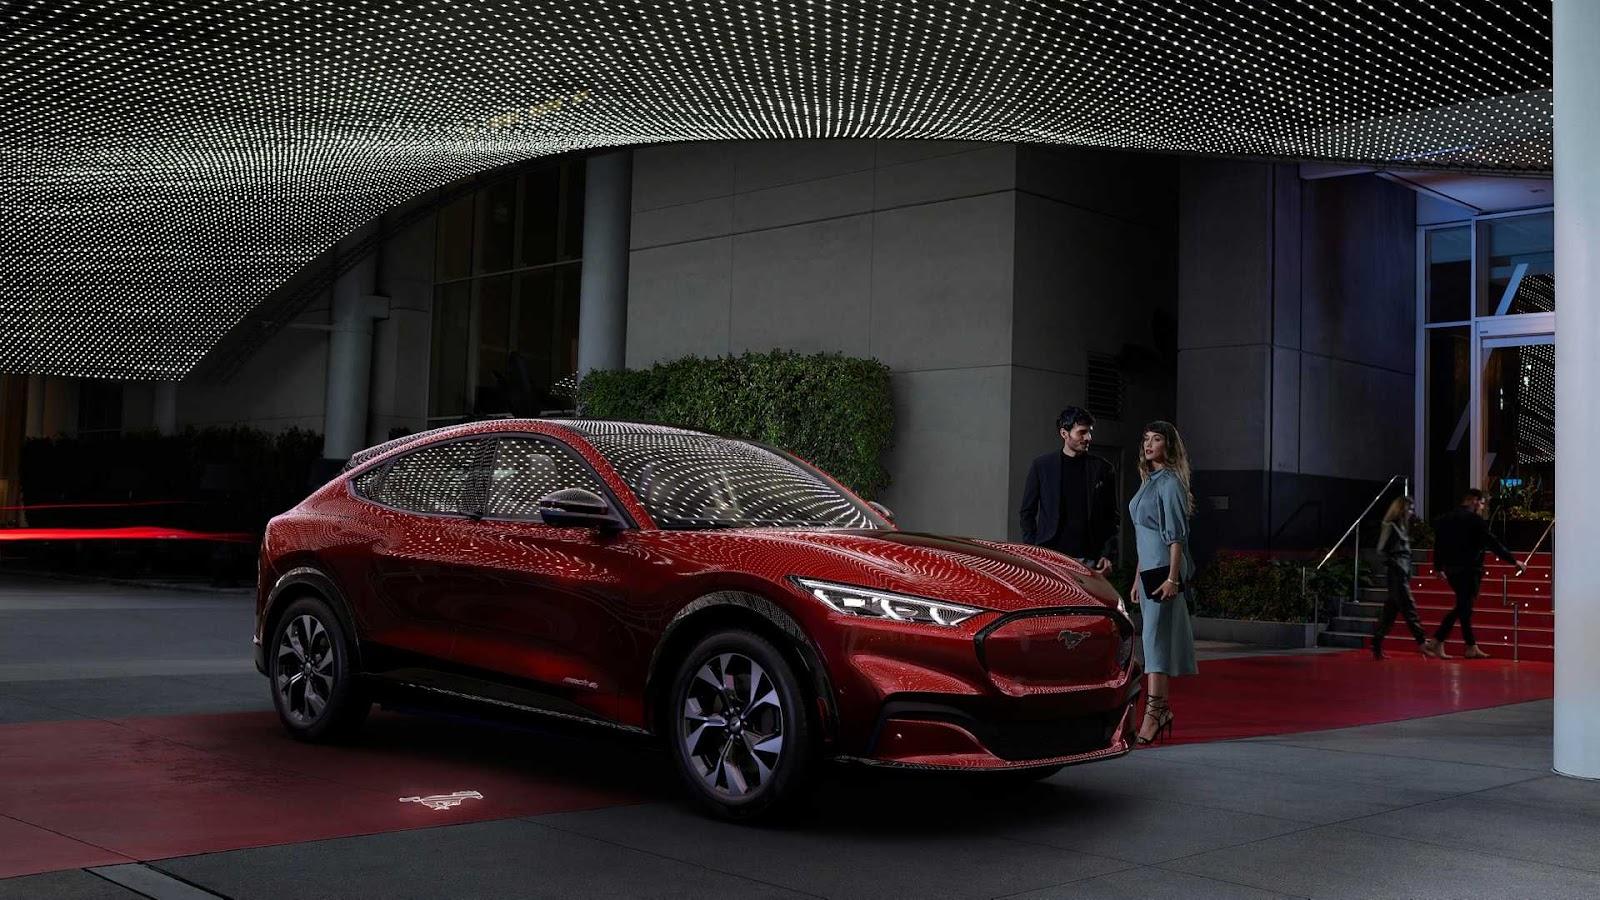 2020-ford-mustang-mach-e-5.jpg